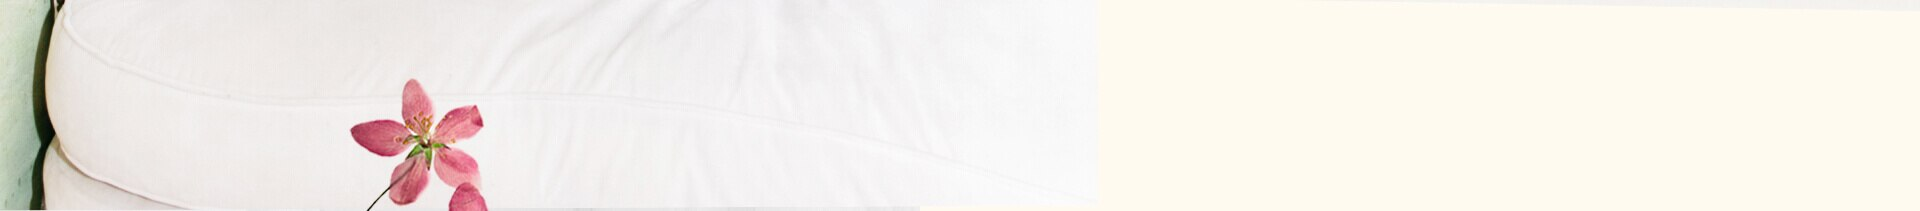 Malika Haqq White Playsuit With Green Leaves Shoot 4 Desktop